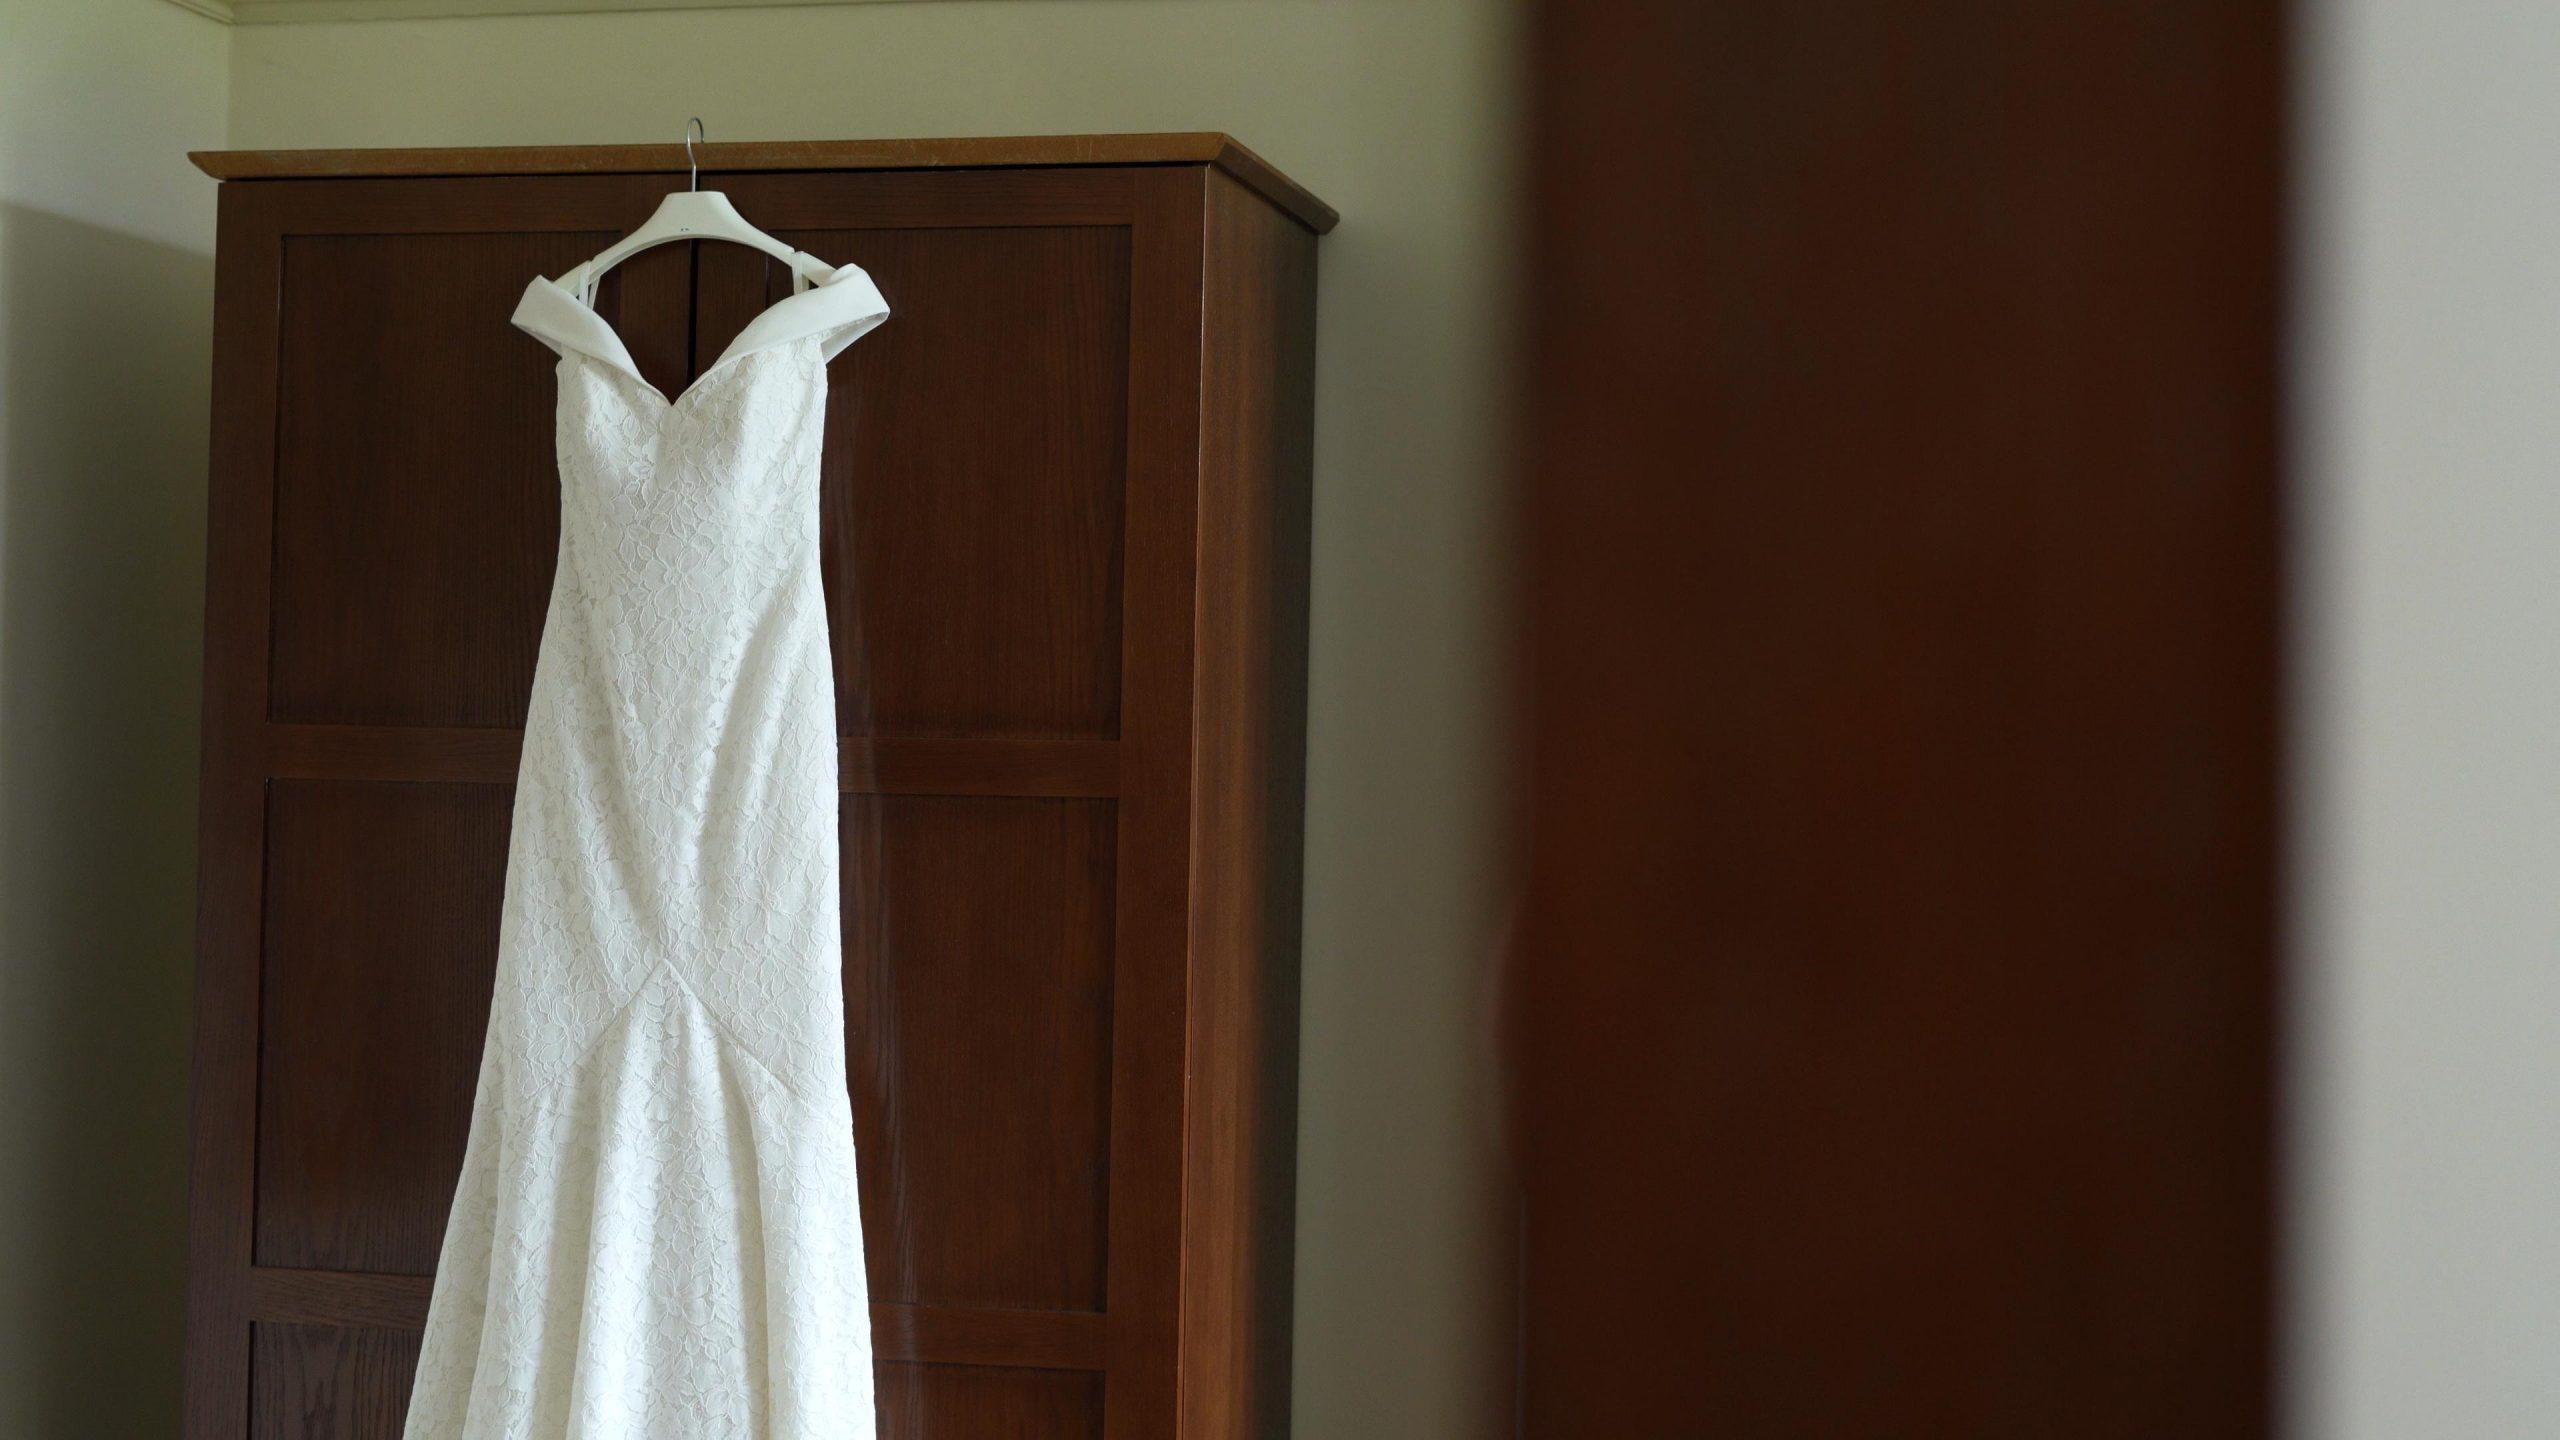 off shoulder wedding dress hangs on wardrobe